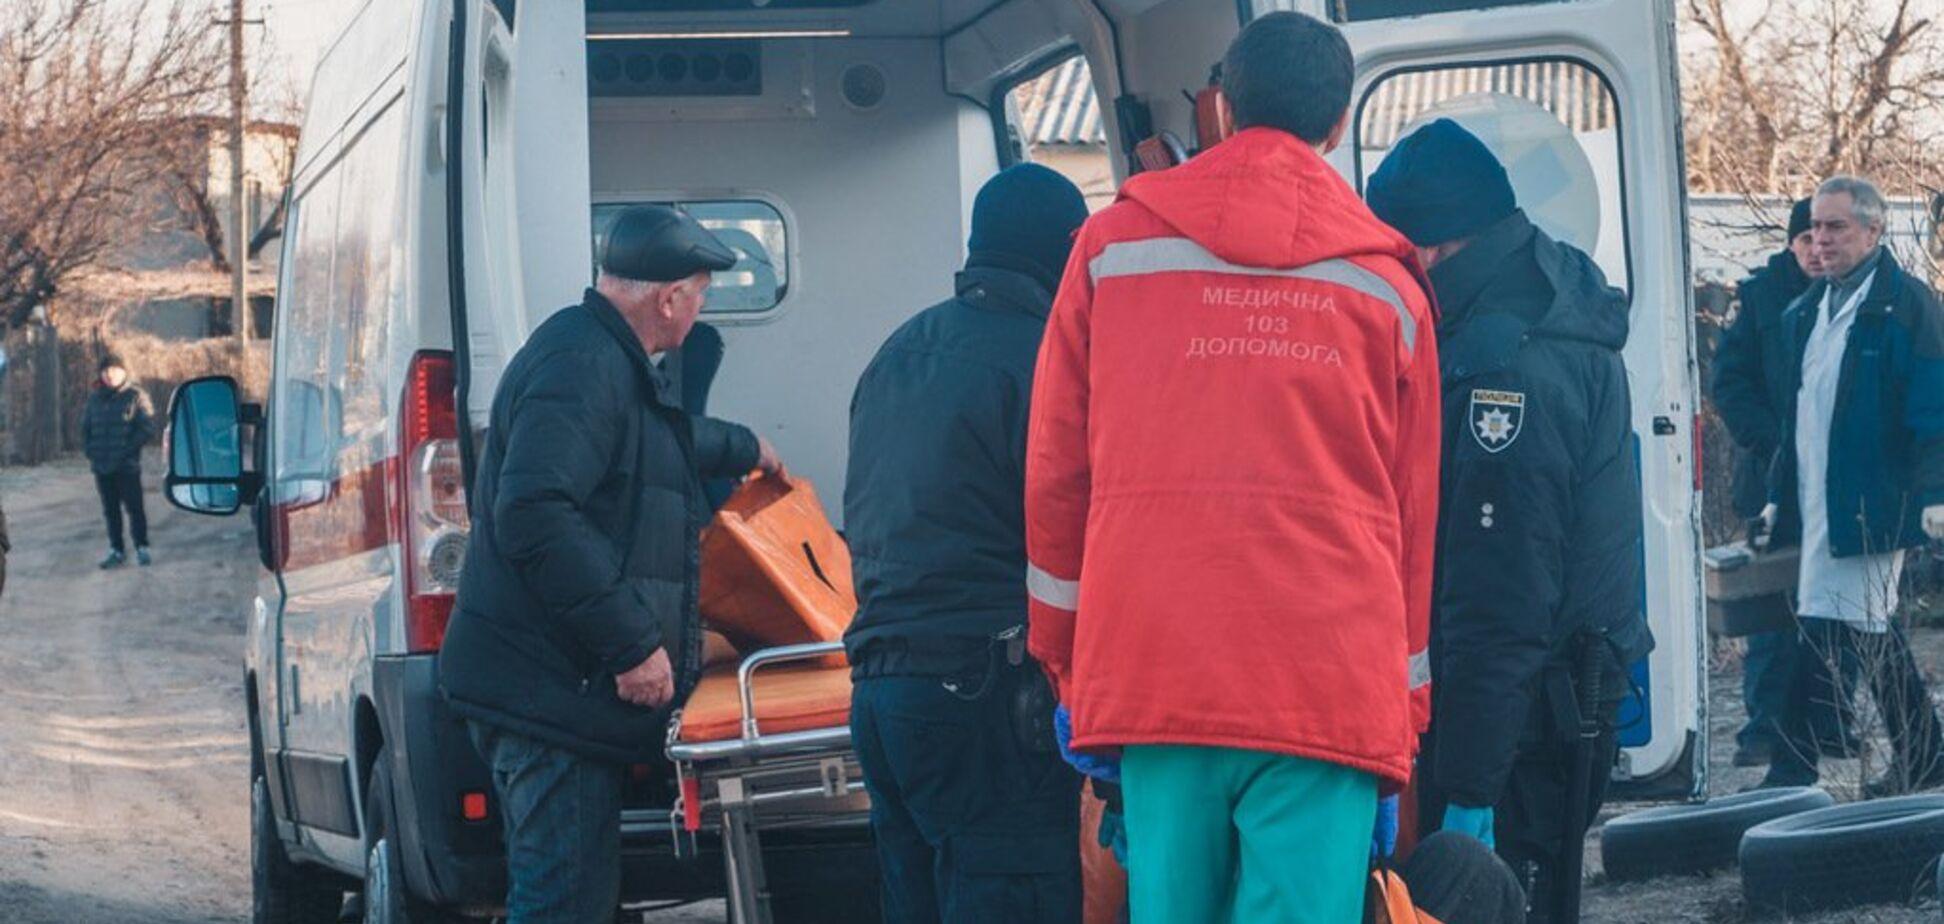 Старшей — 103 года: в Днепре битами избили пенсионерок